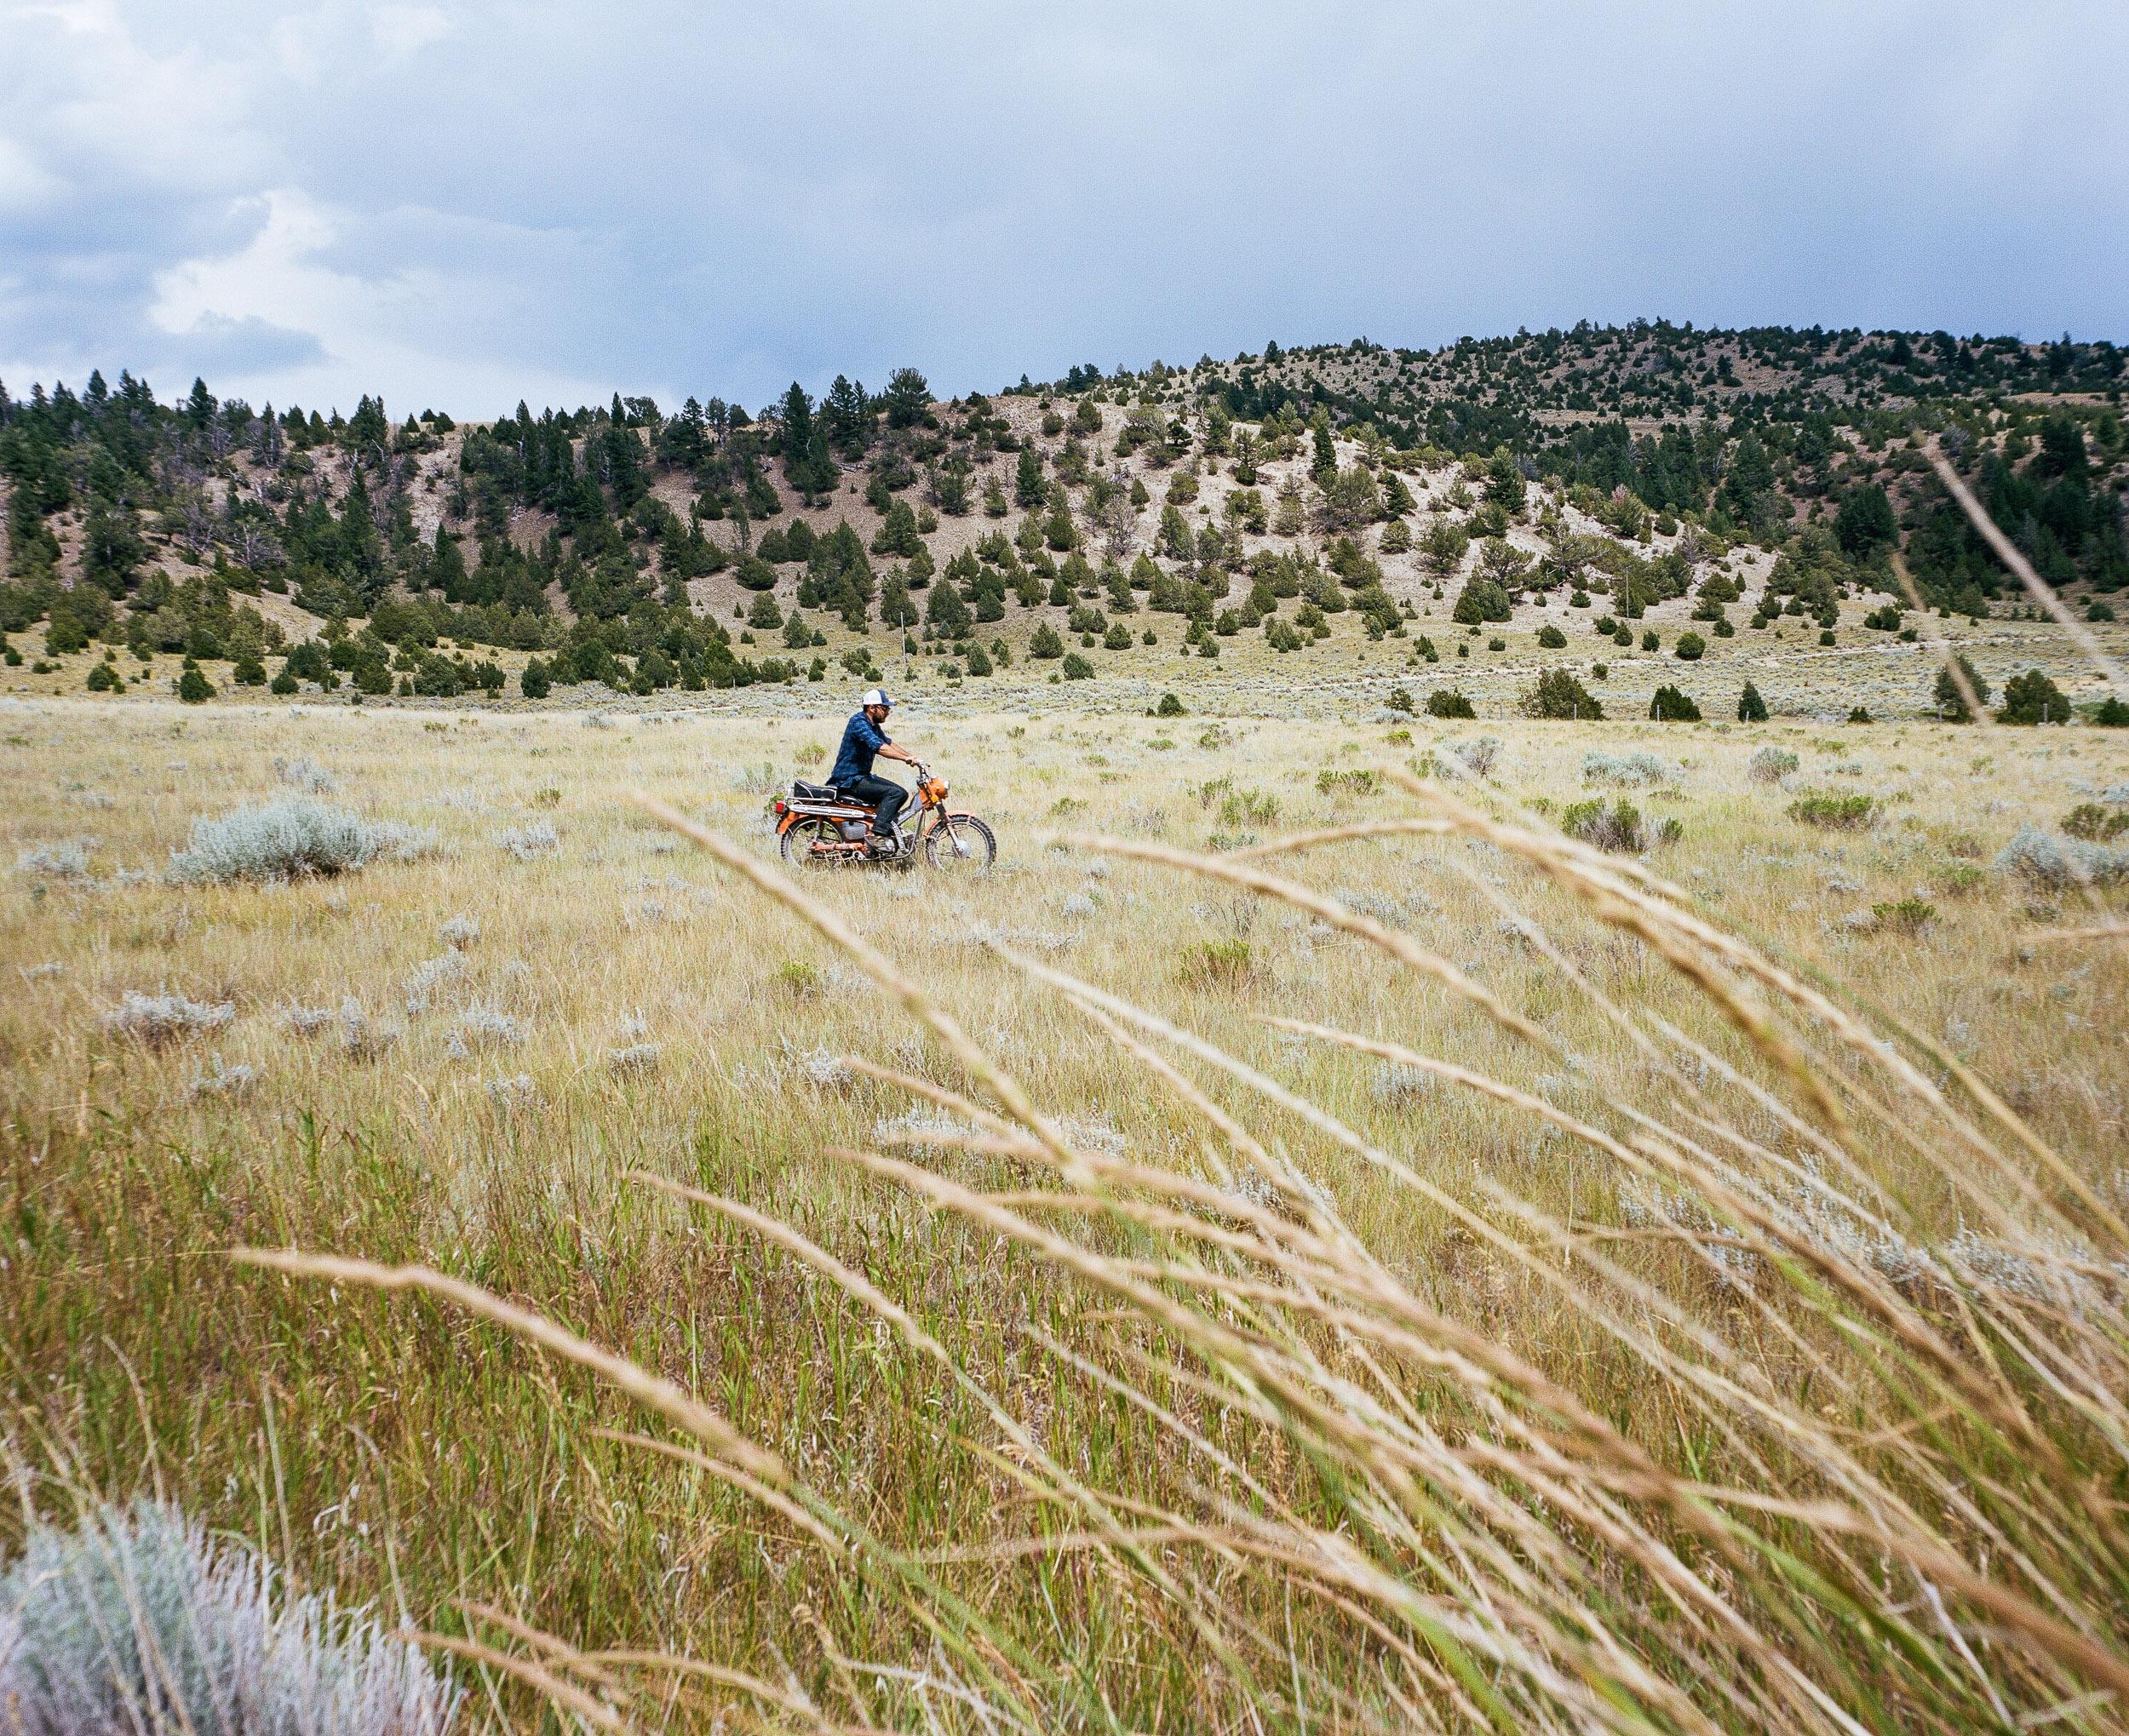 Motorcycle rider riding an orange trail 90 through the grass and sagebrush